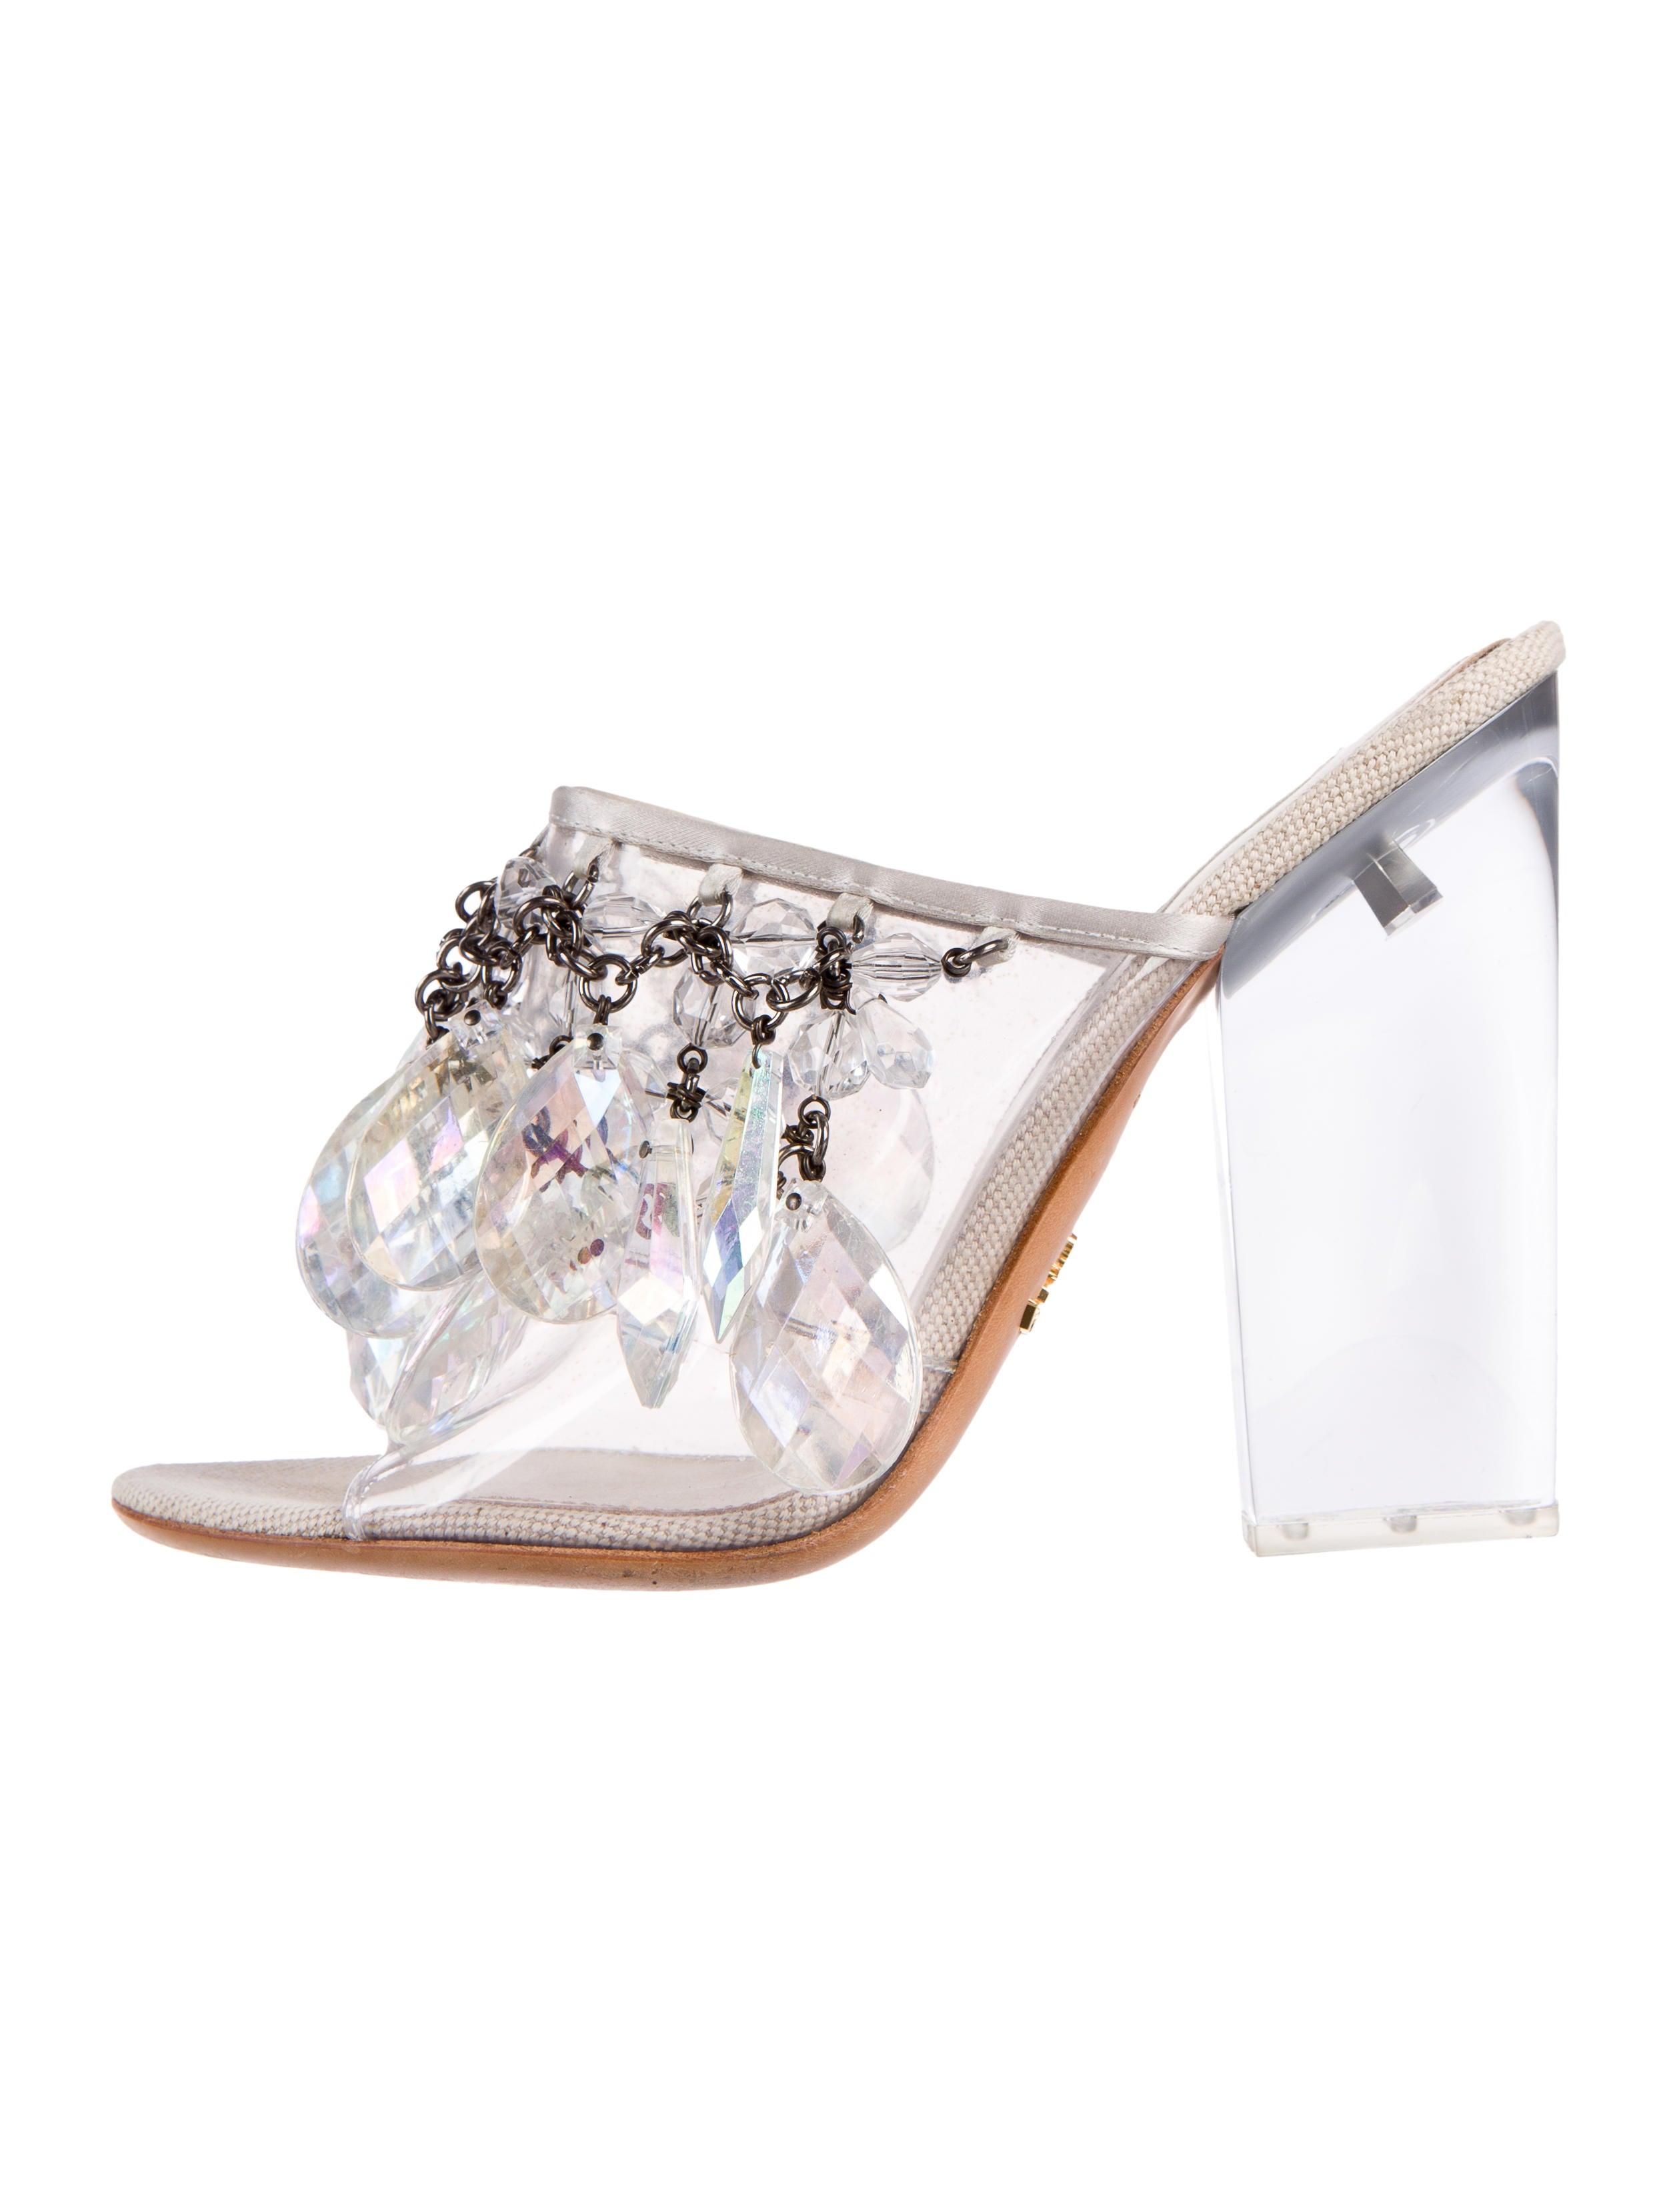 deb2016bb675e4 Prada Chandelier Slide Sandals - Shoes - PRA97208